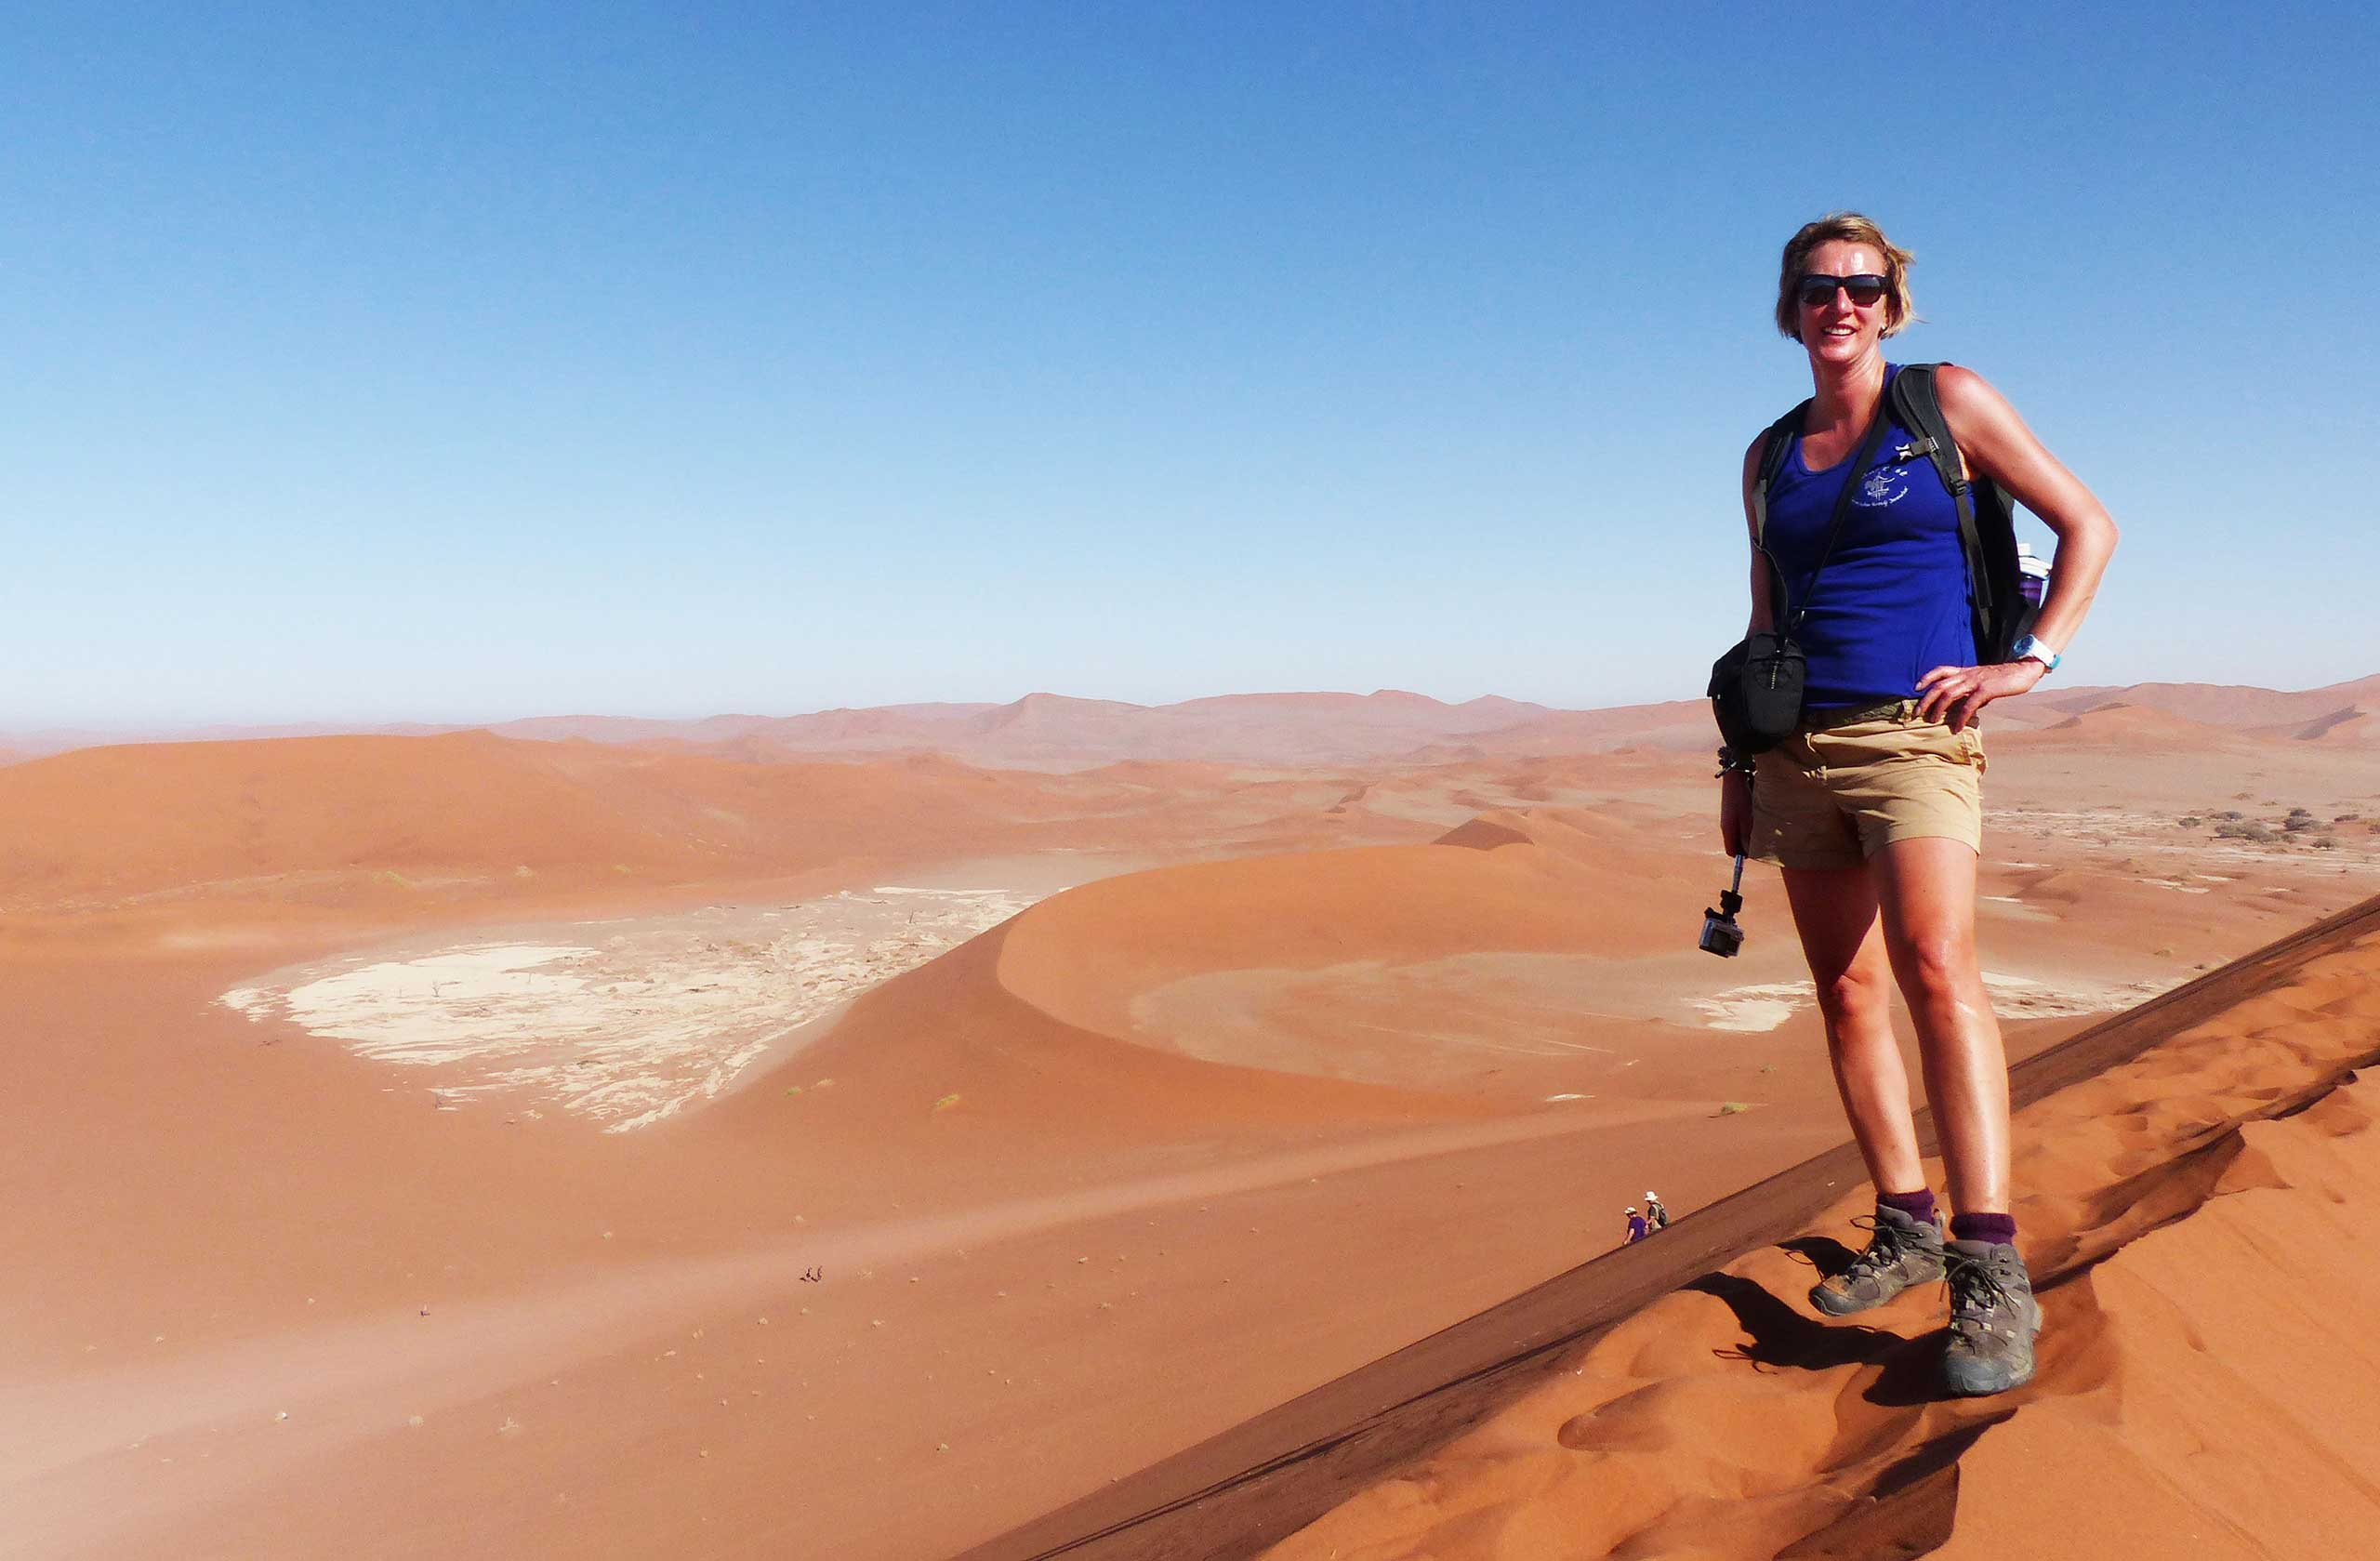 Big Daddy Sand Dune, Sossusvlei, Namibia, Africa. Fantastic 6 Dunes & Wildlife Tour of Namibia